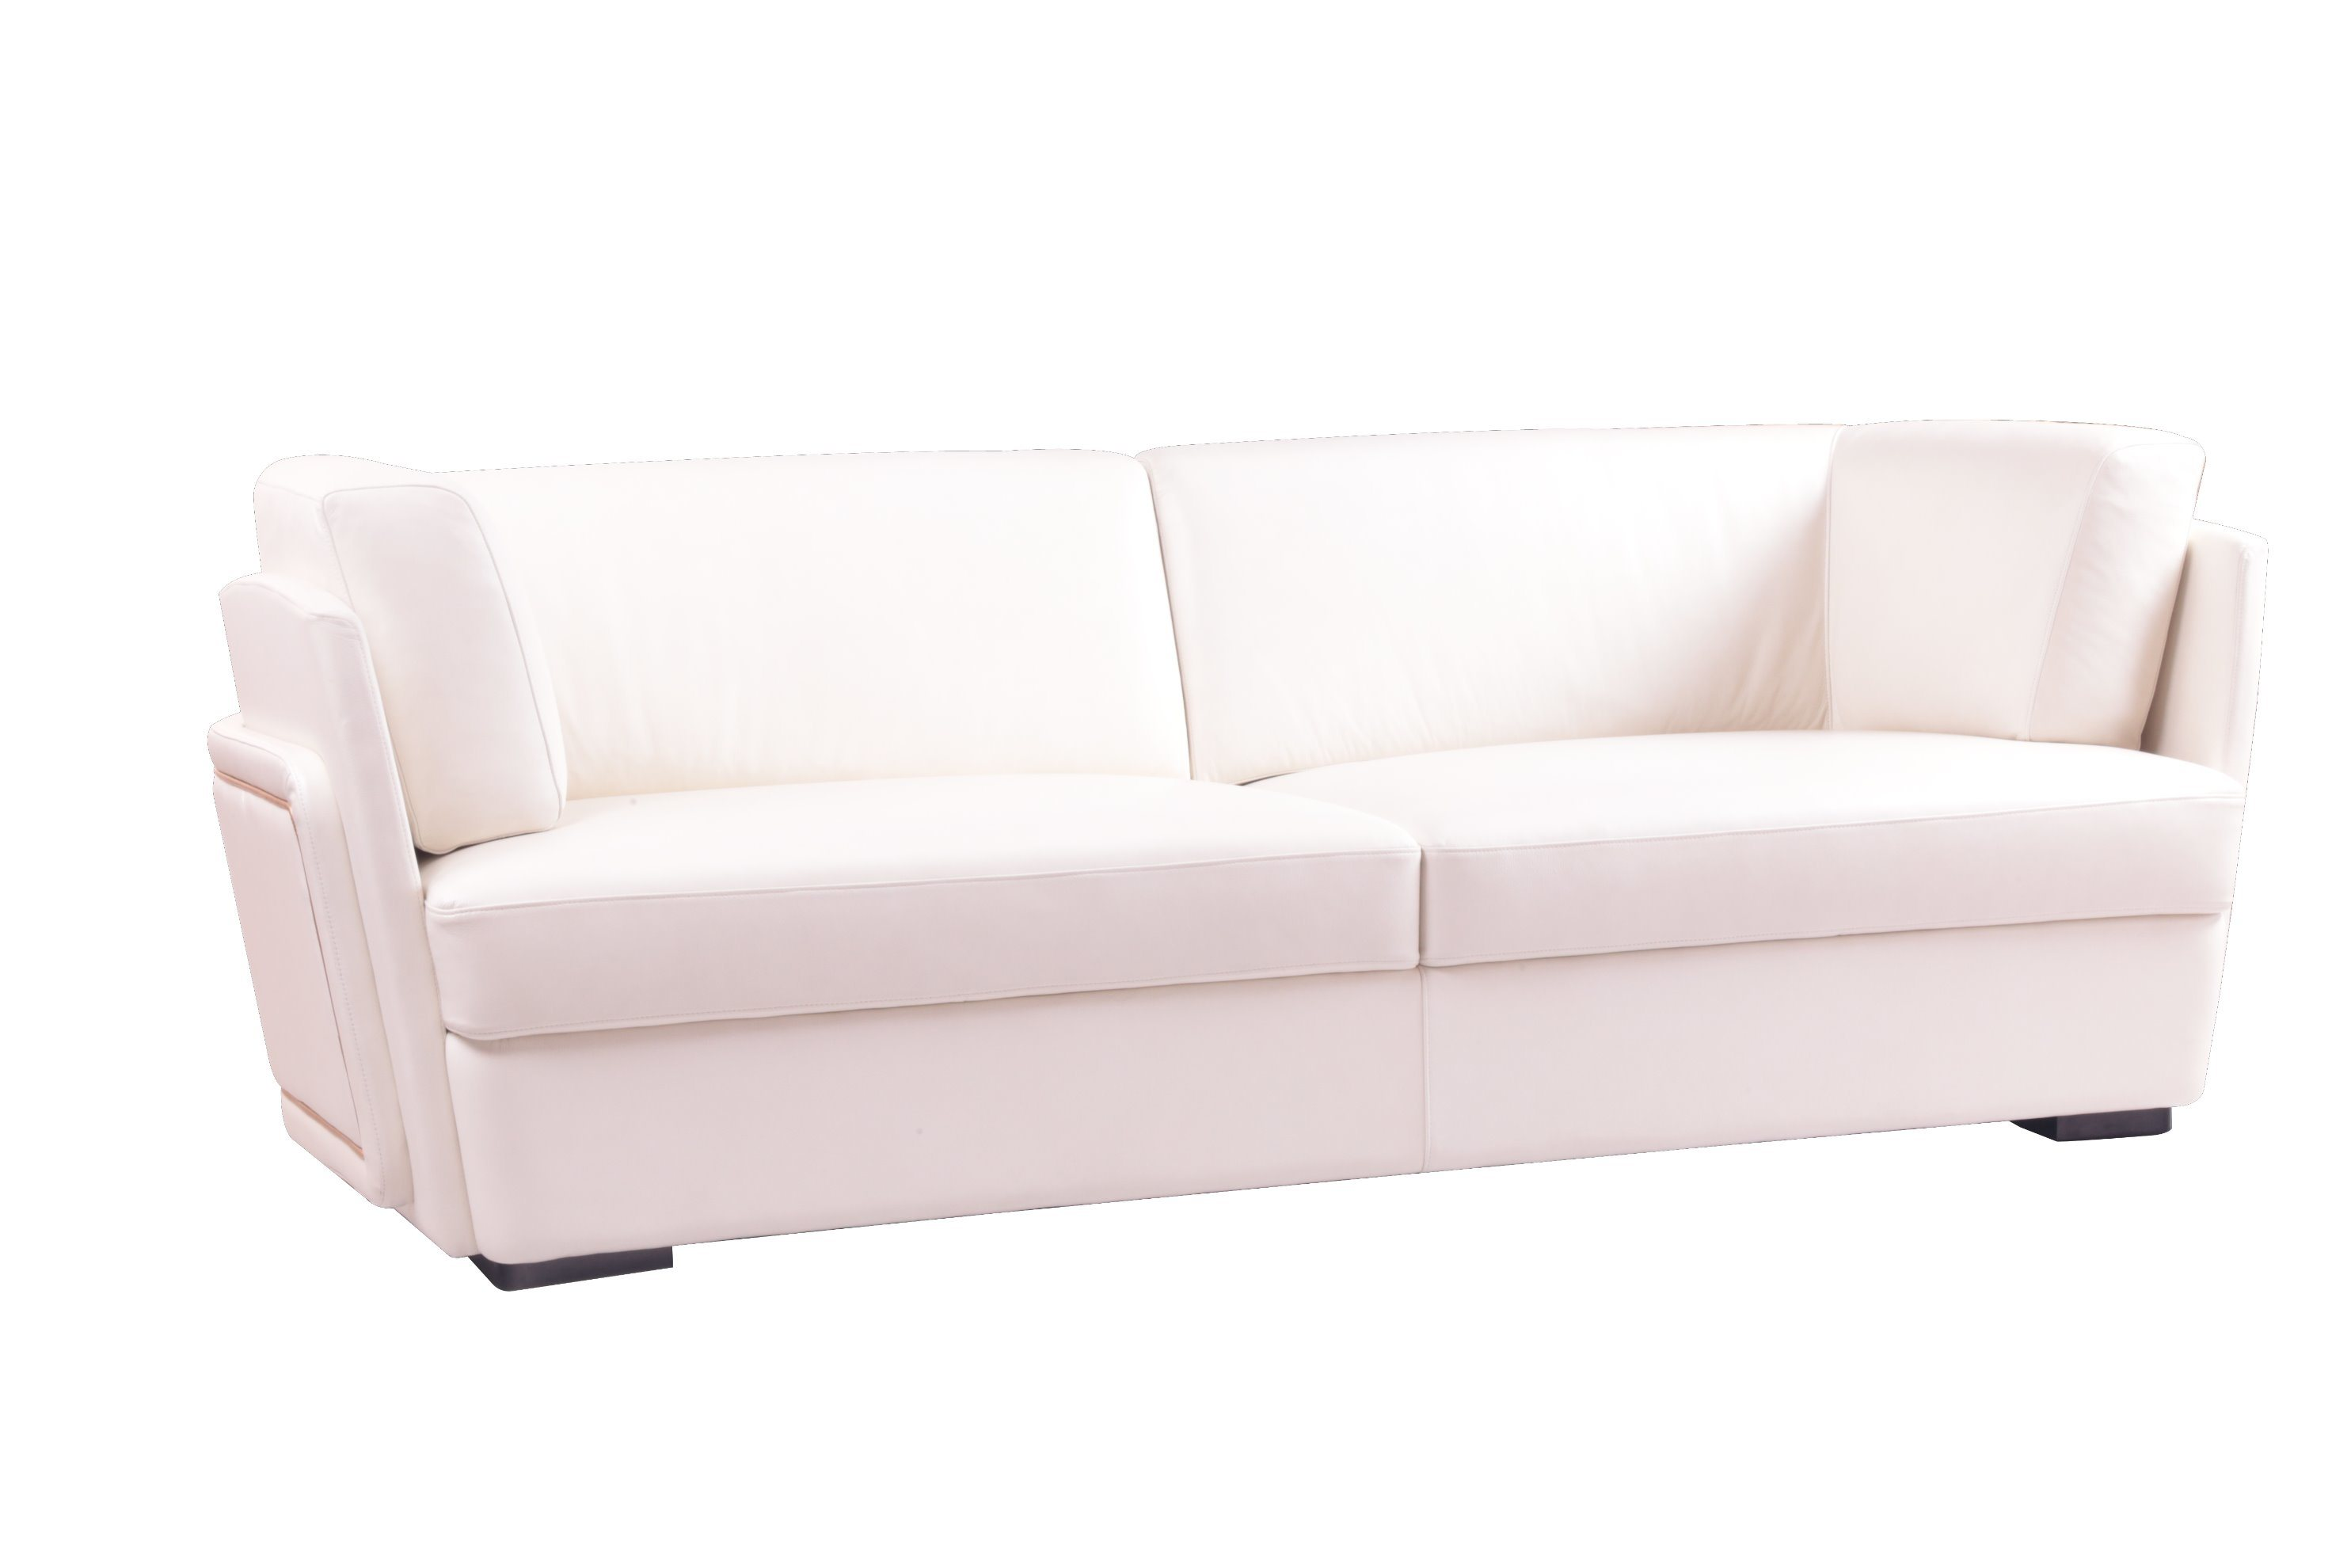 New Arrive Italian Design Leather Fabric Upholstered Livingroom Furniture